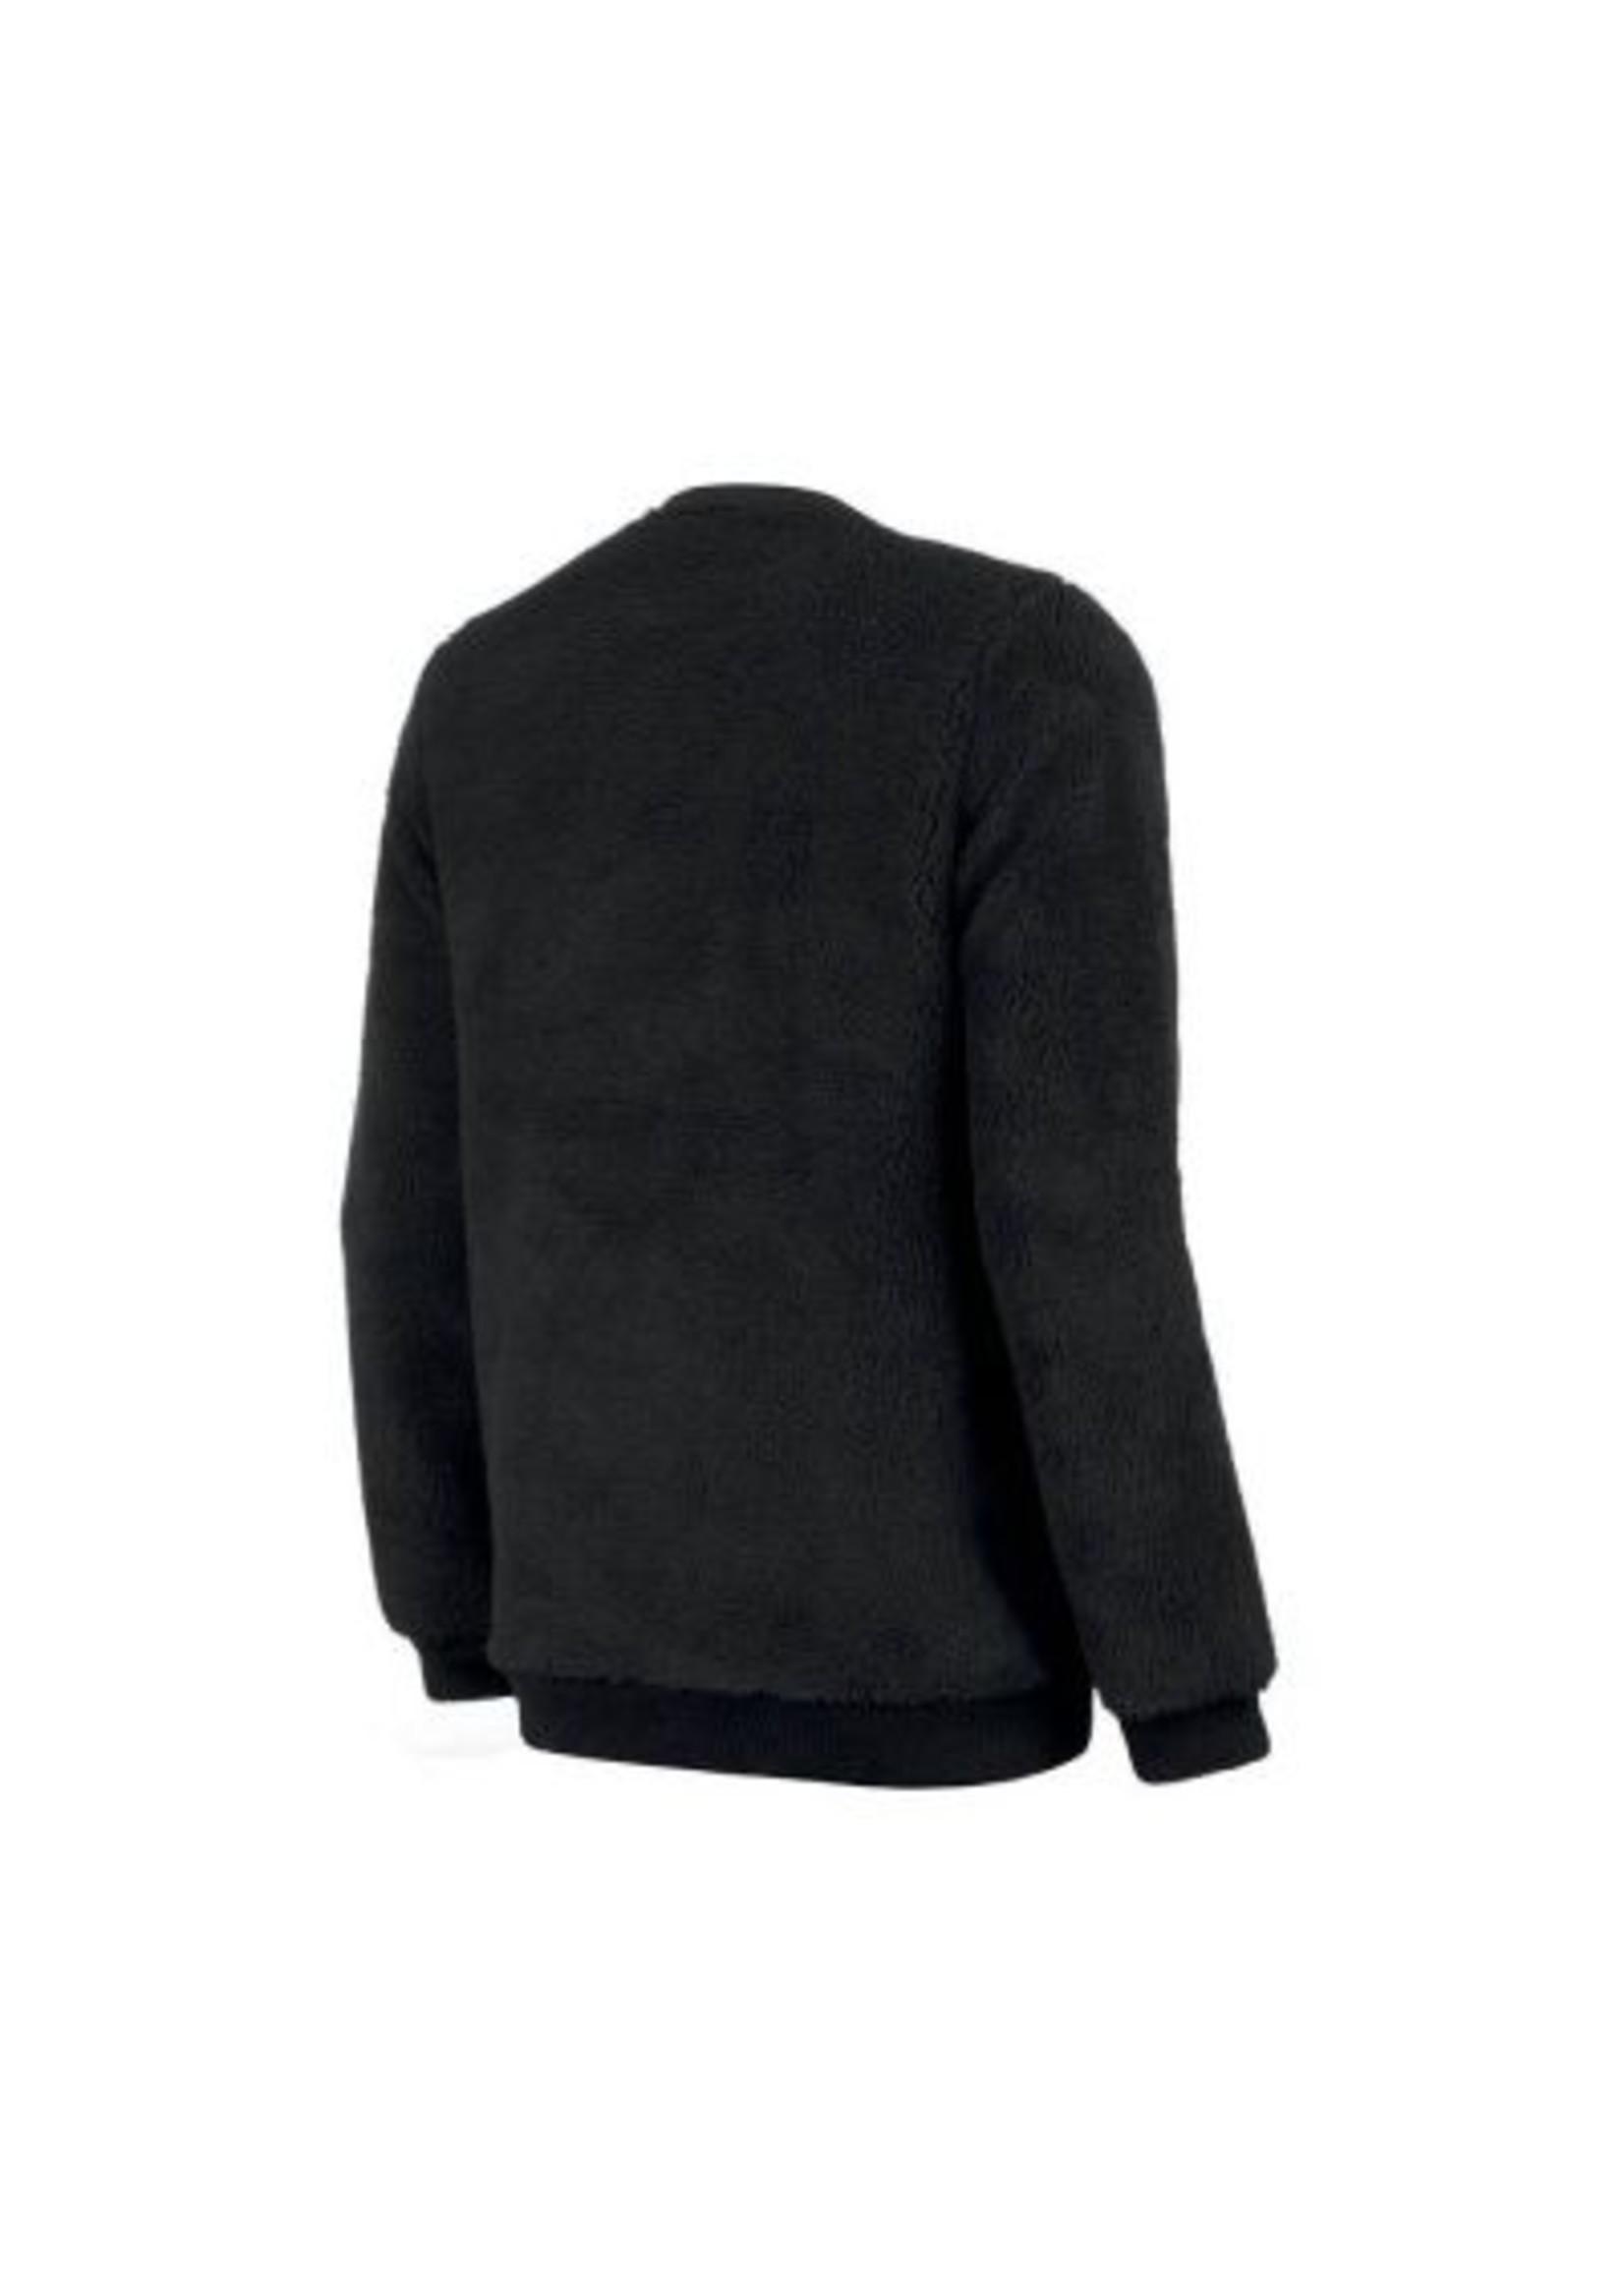 Picture Organic Clothing STELLAR OPINEL CREW